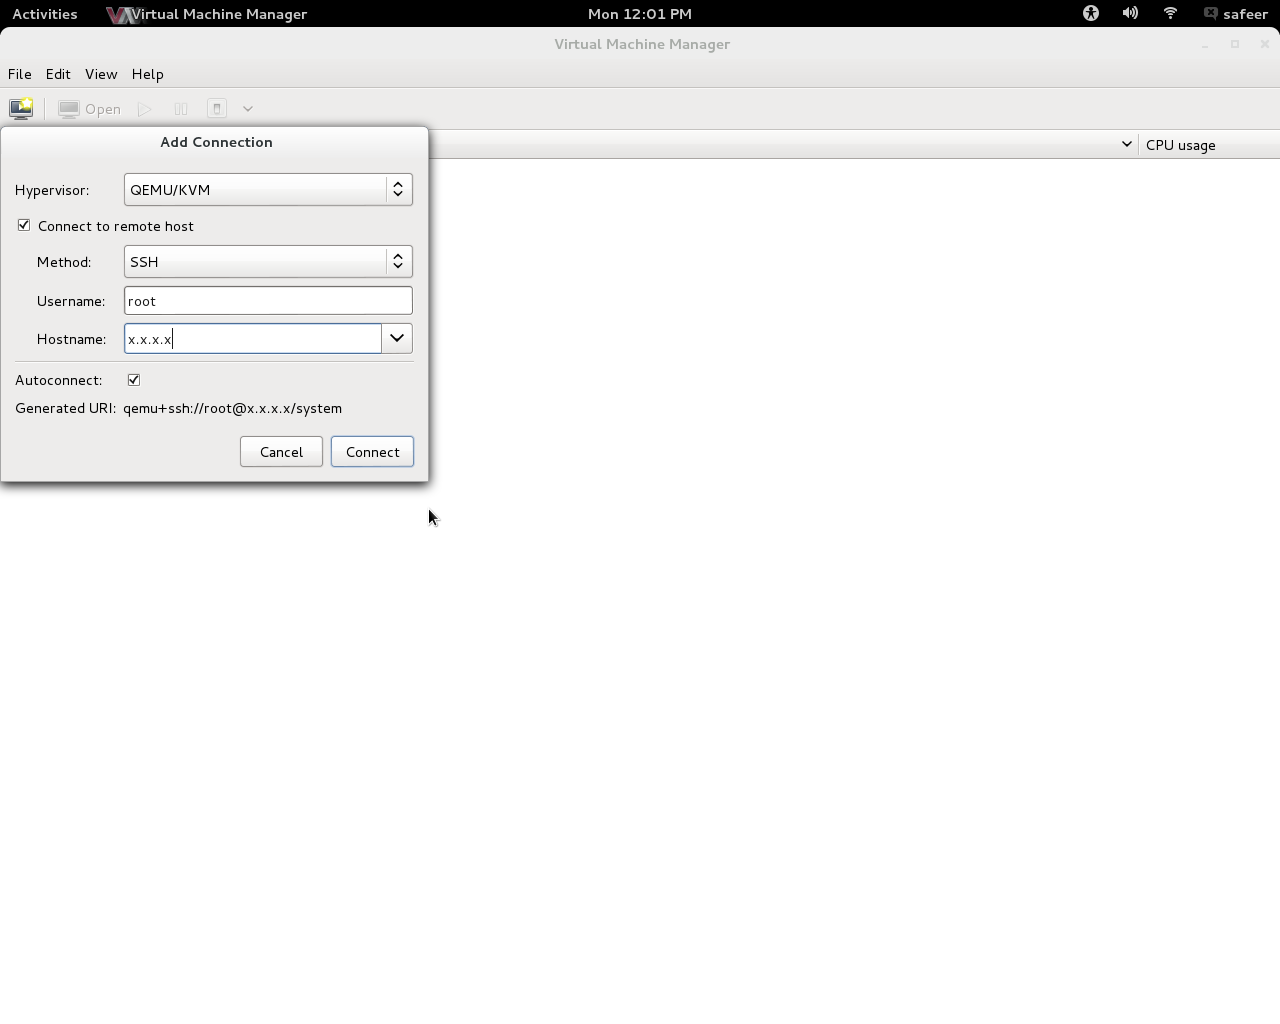 Dual boot (Windows 7 + Ubuntu 12 04) HP Elite 8300